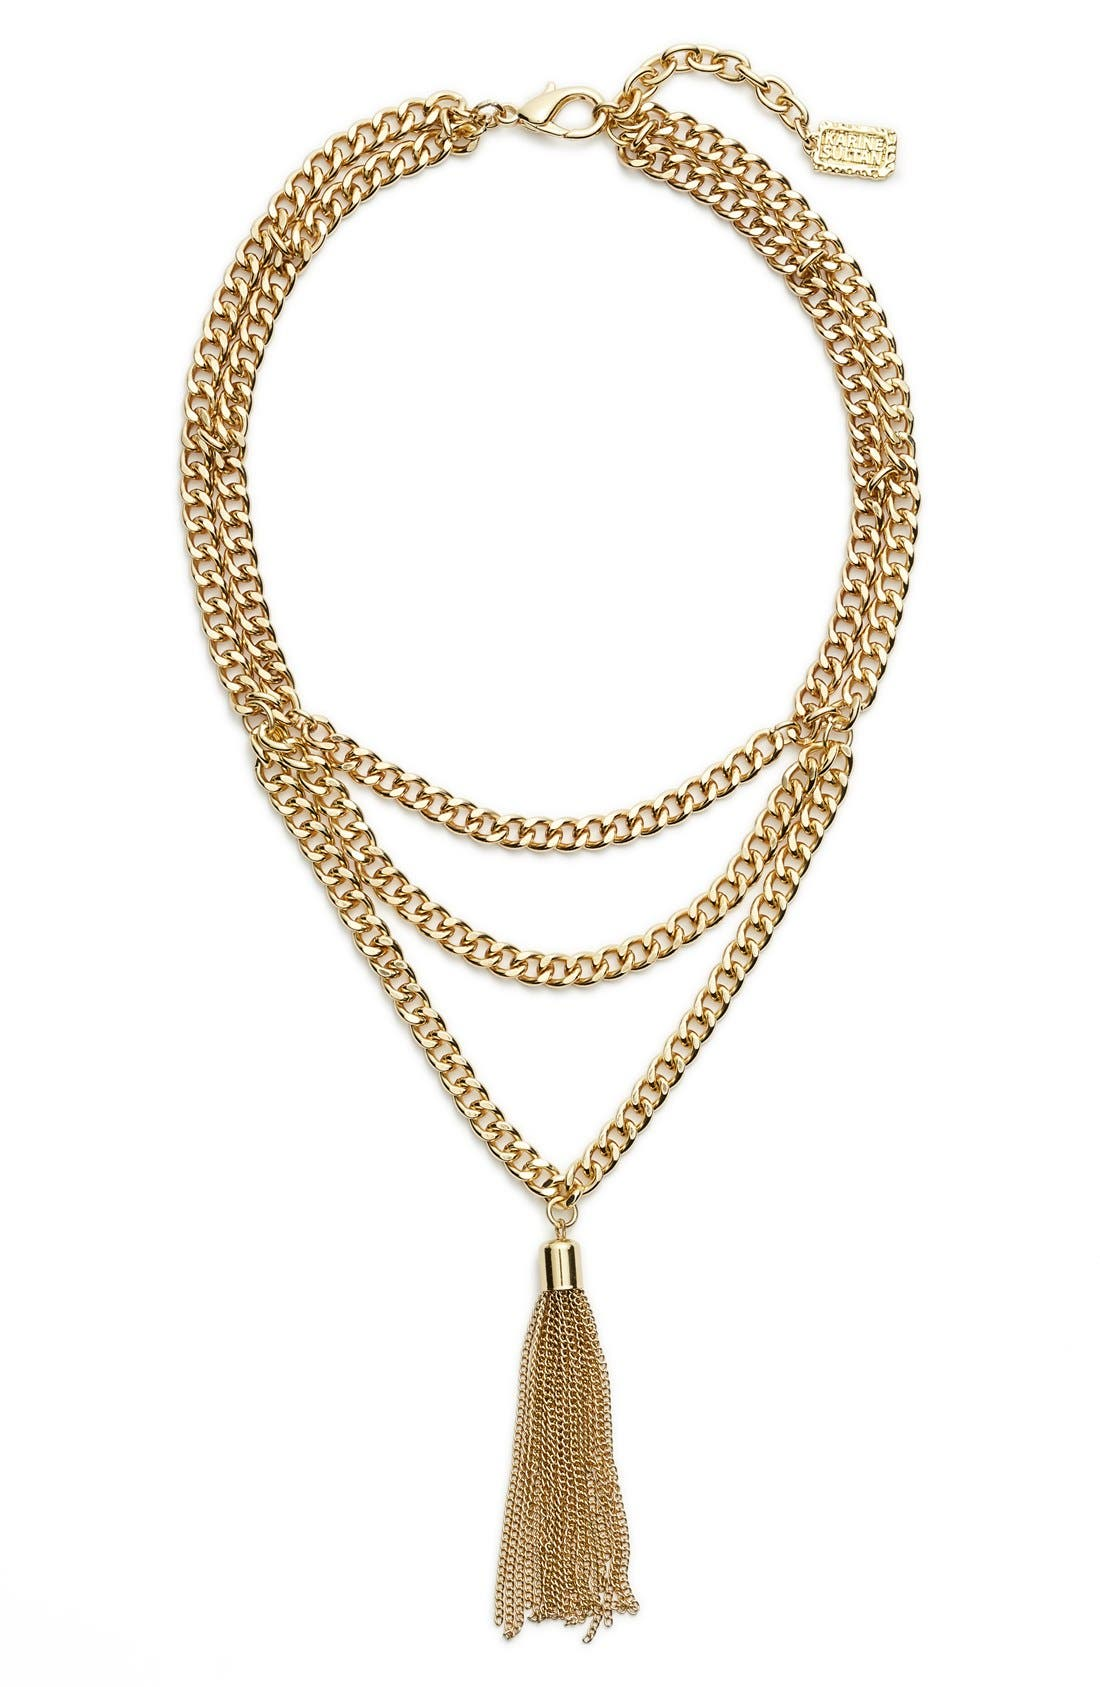 Karine Sultan Layered Y-Necklace